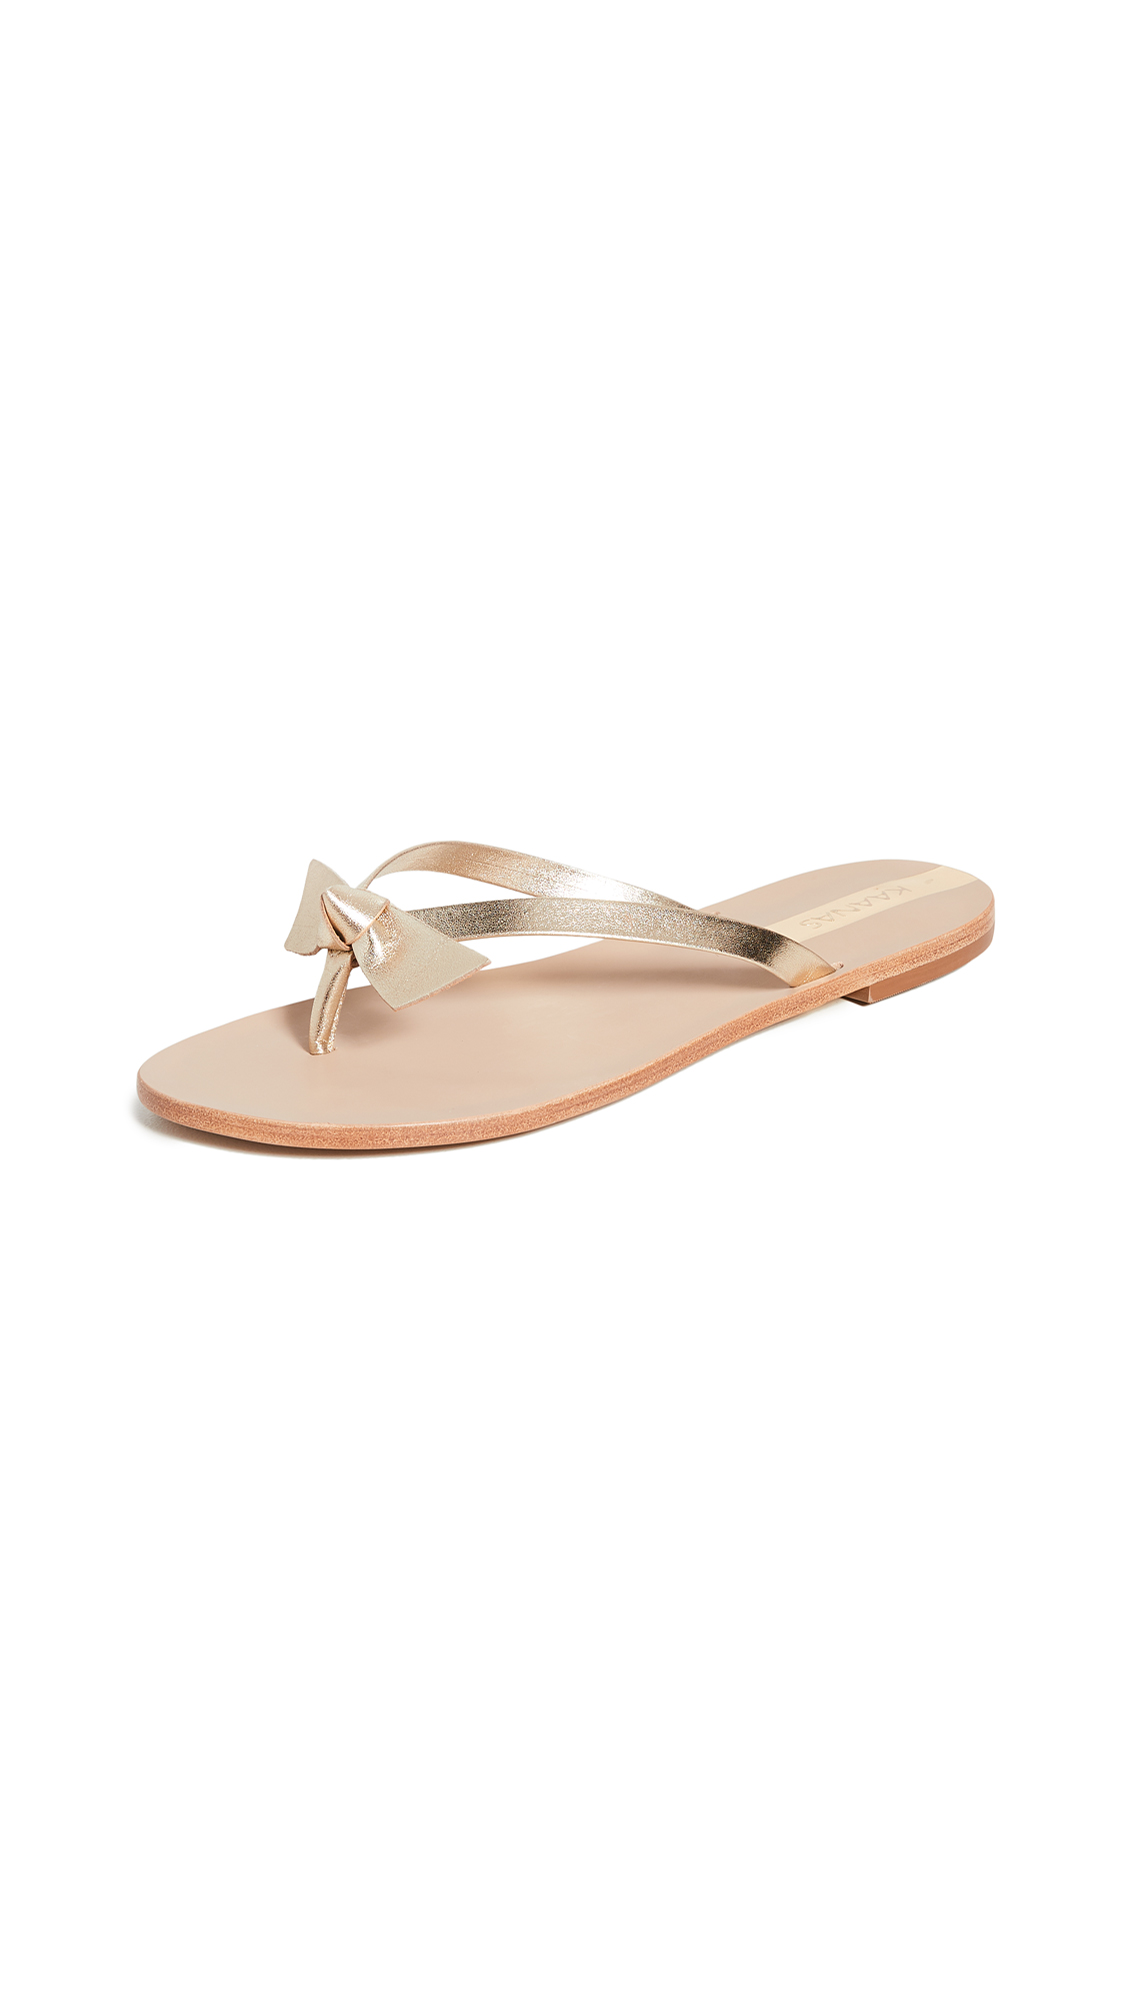 Buy KAANAS Macapa Flip Flops online, shop KAANAS